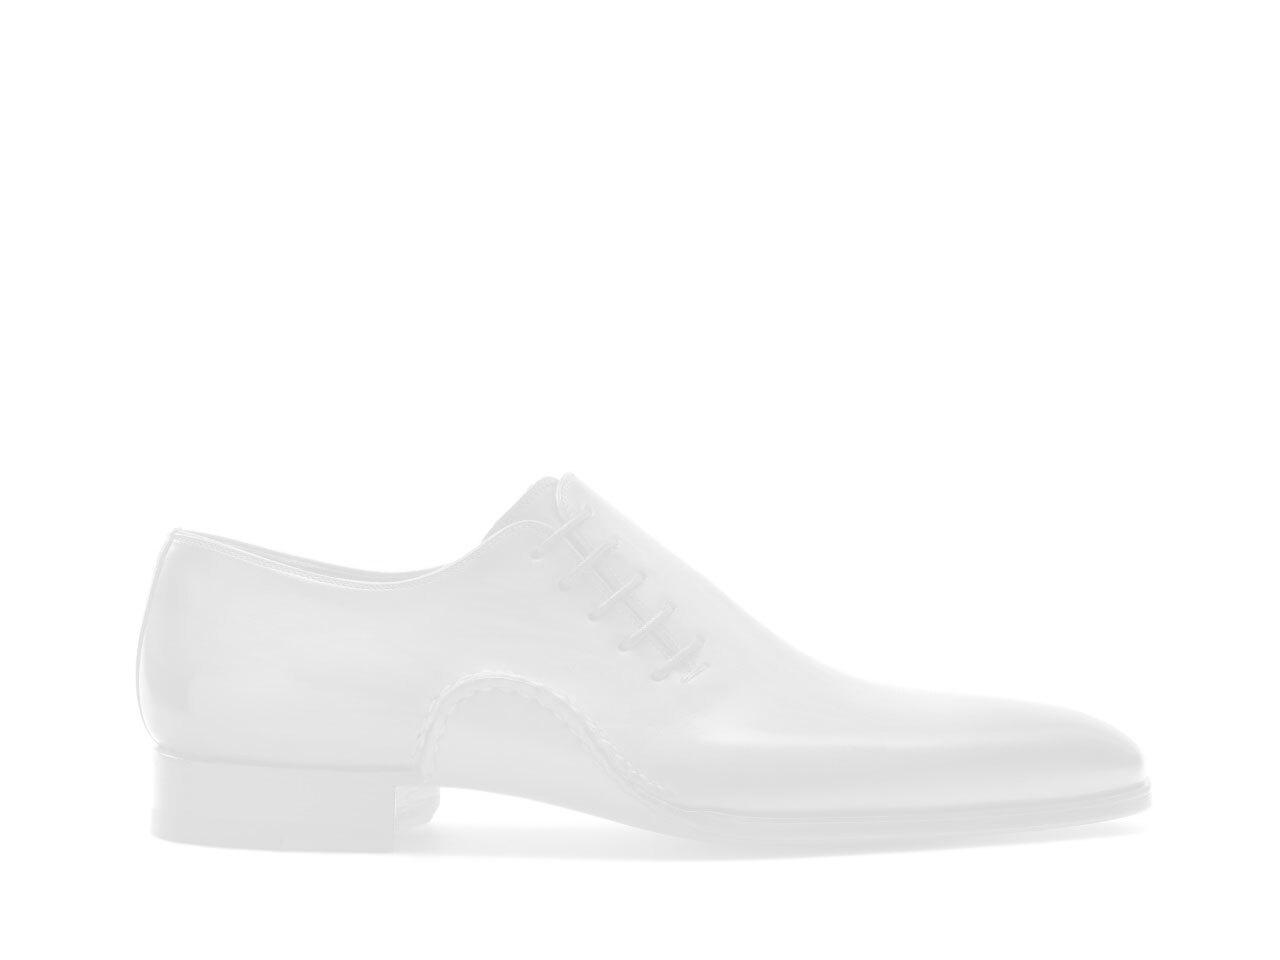 Sole of the Magnanni Ruente Black Men's Sneakers